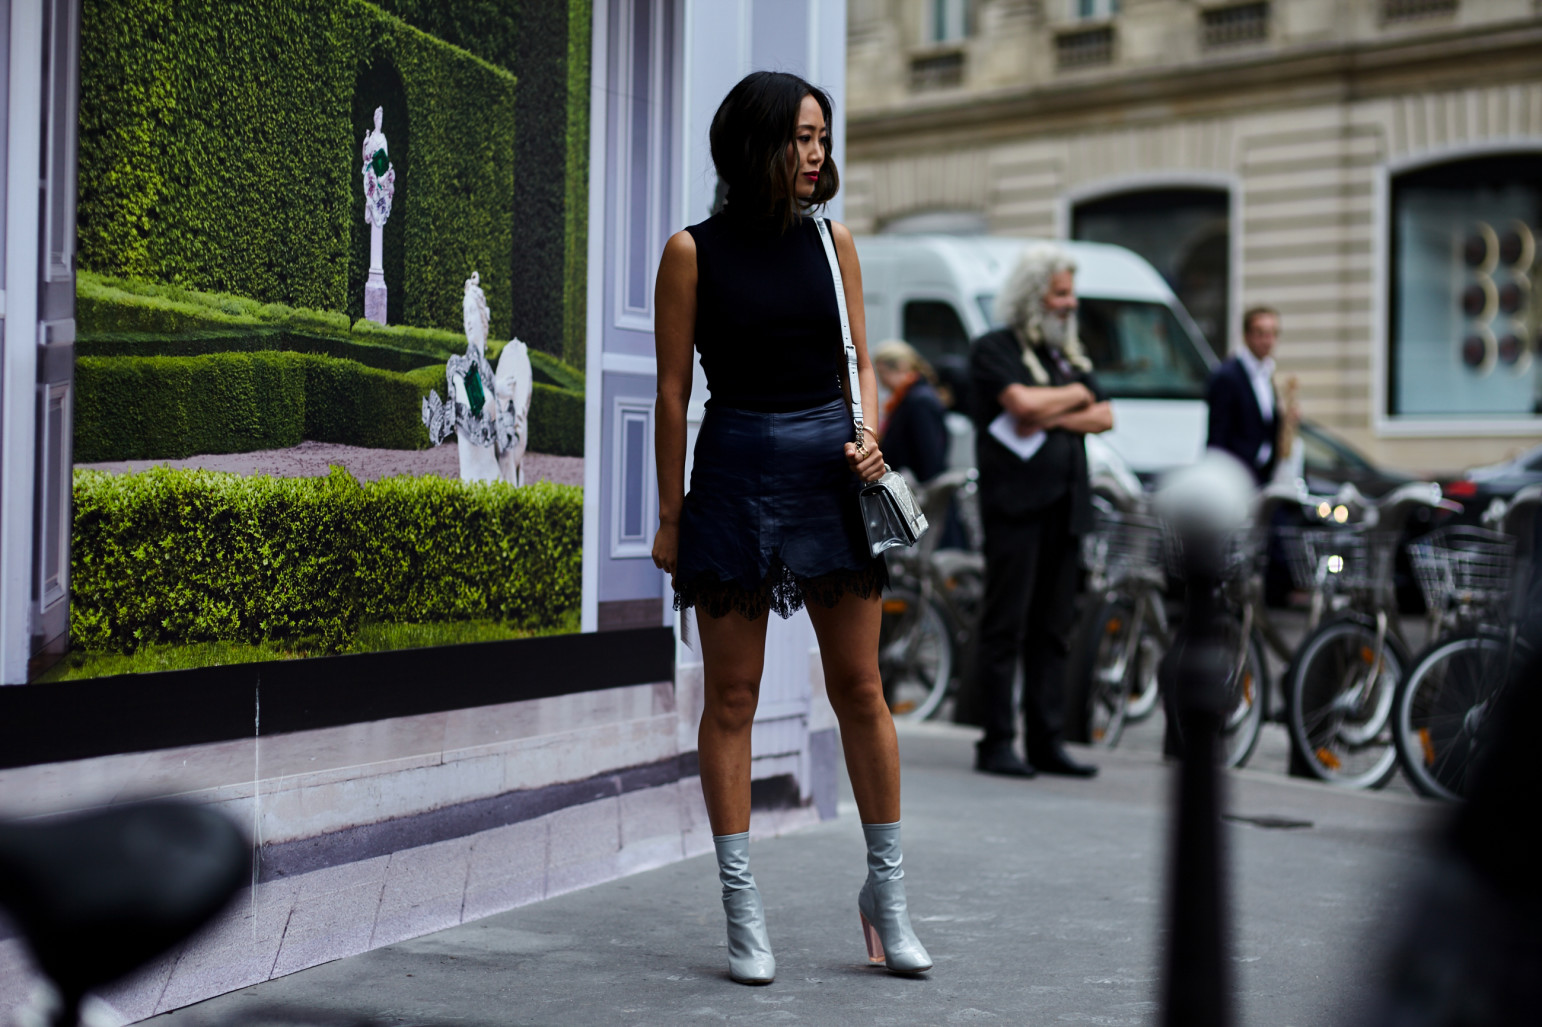 ShotByGio-George-Angelis-Paris-Haute-Couture-Fashion-Week-Fall-2016-8920-1542x1027.jpg